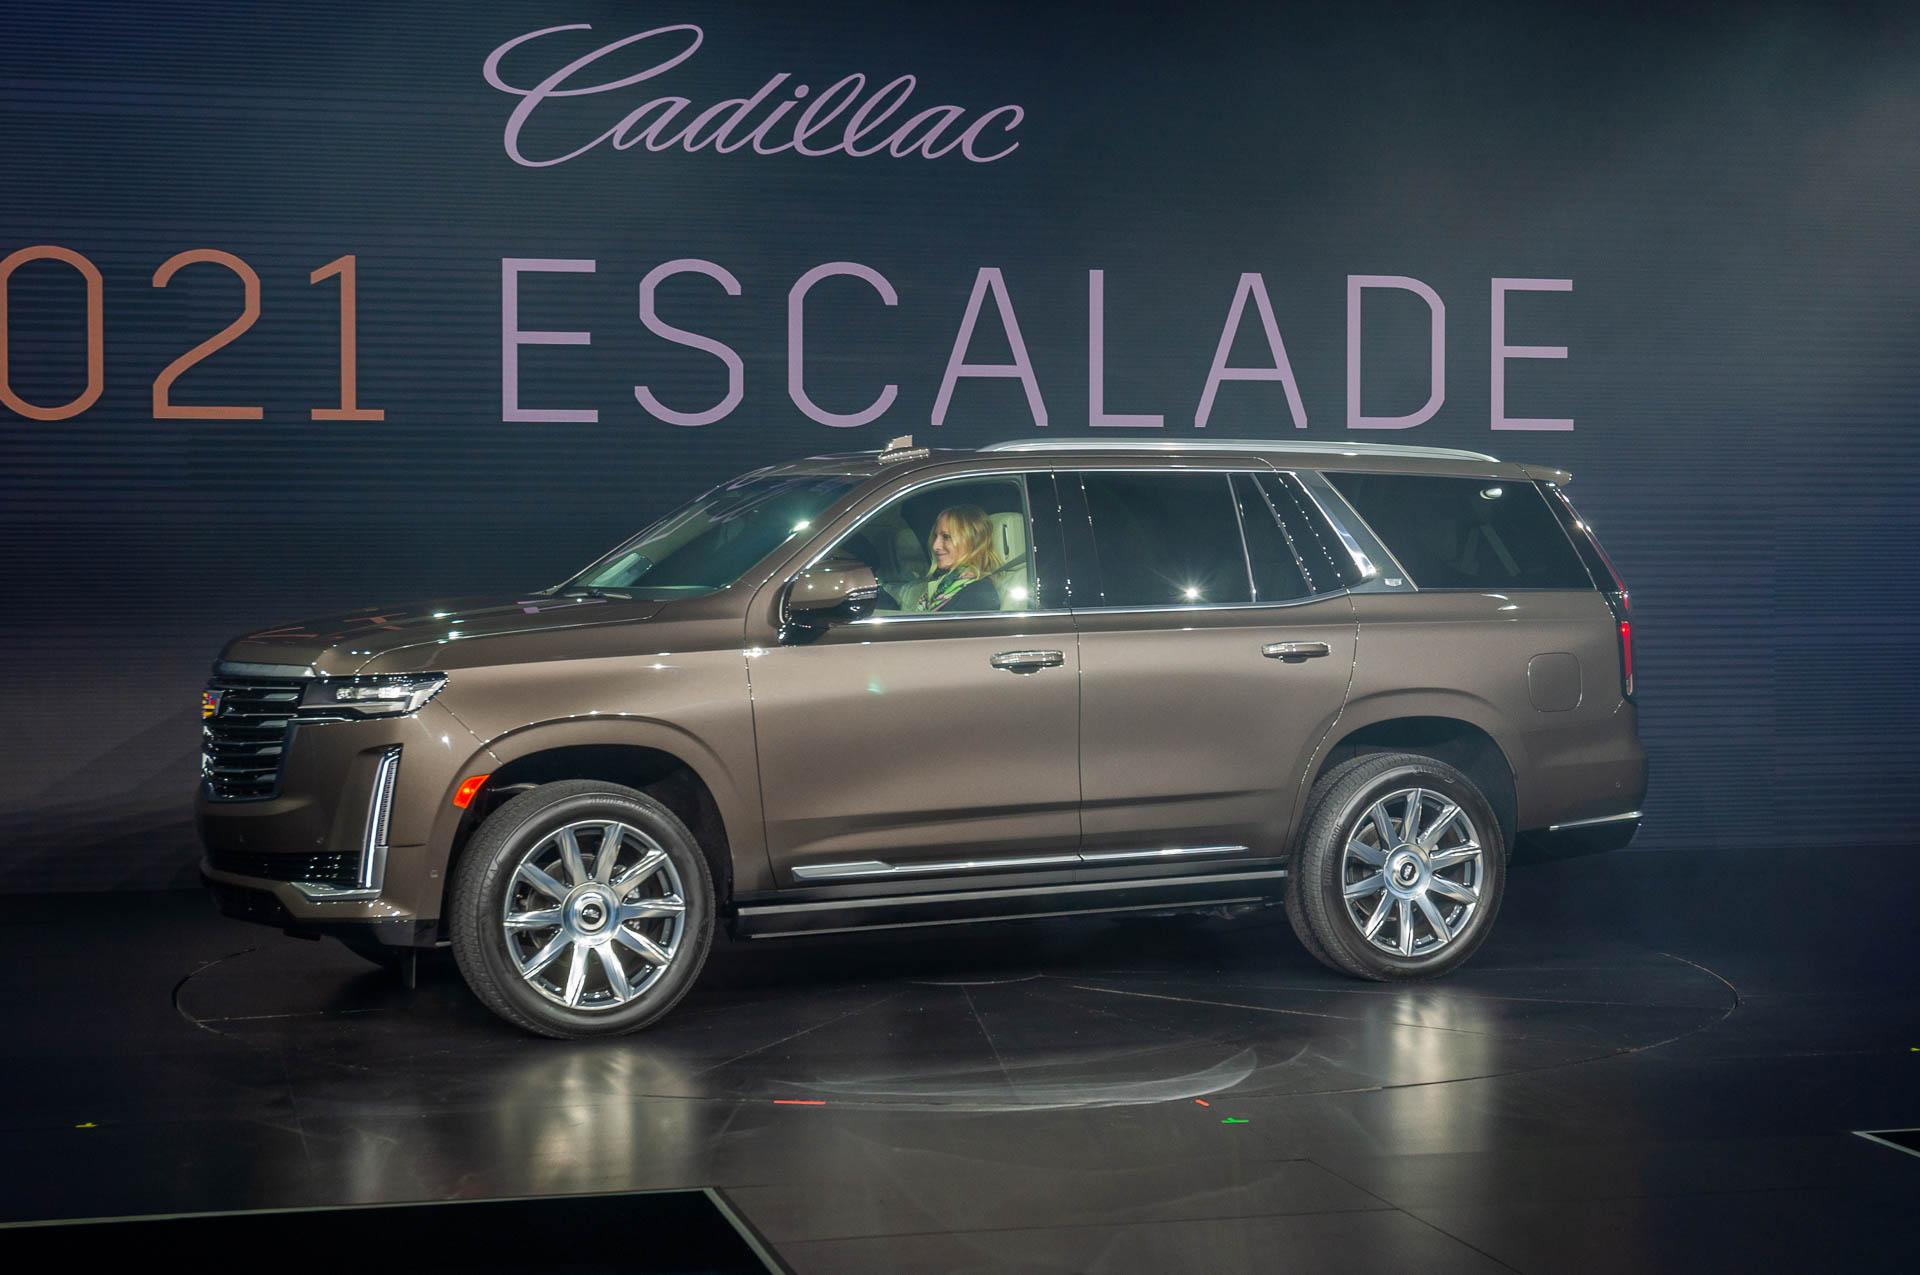 2021 cadillac escalade luxury suv starts at 77490 up